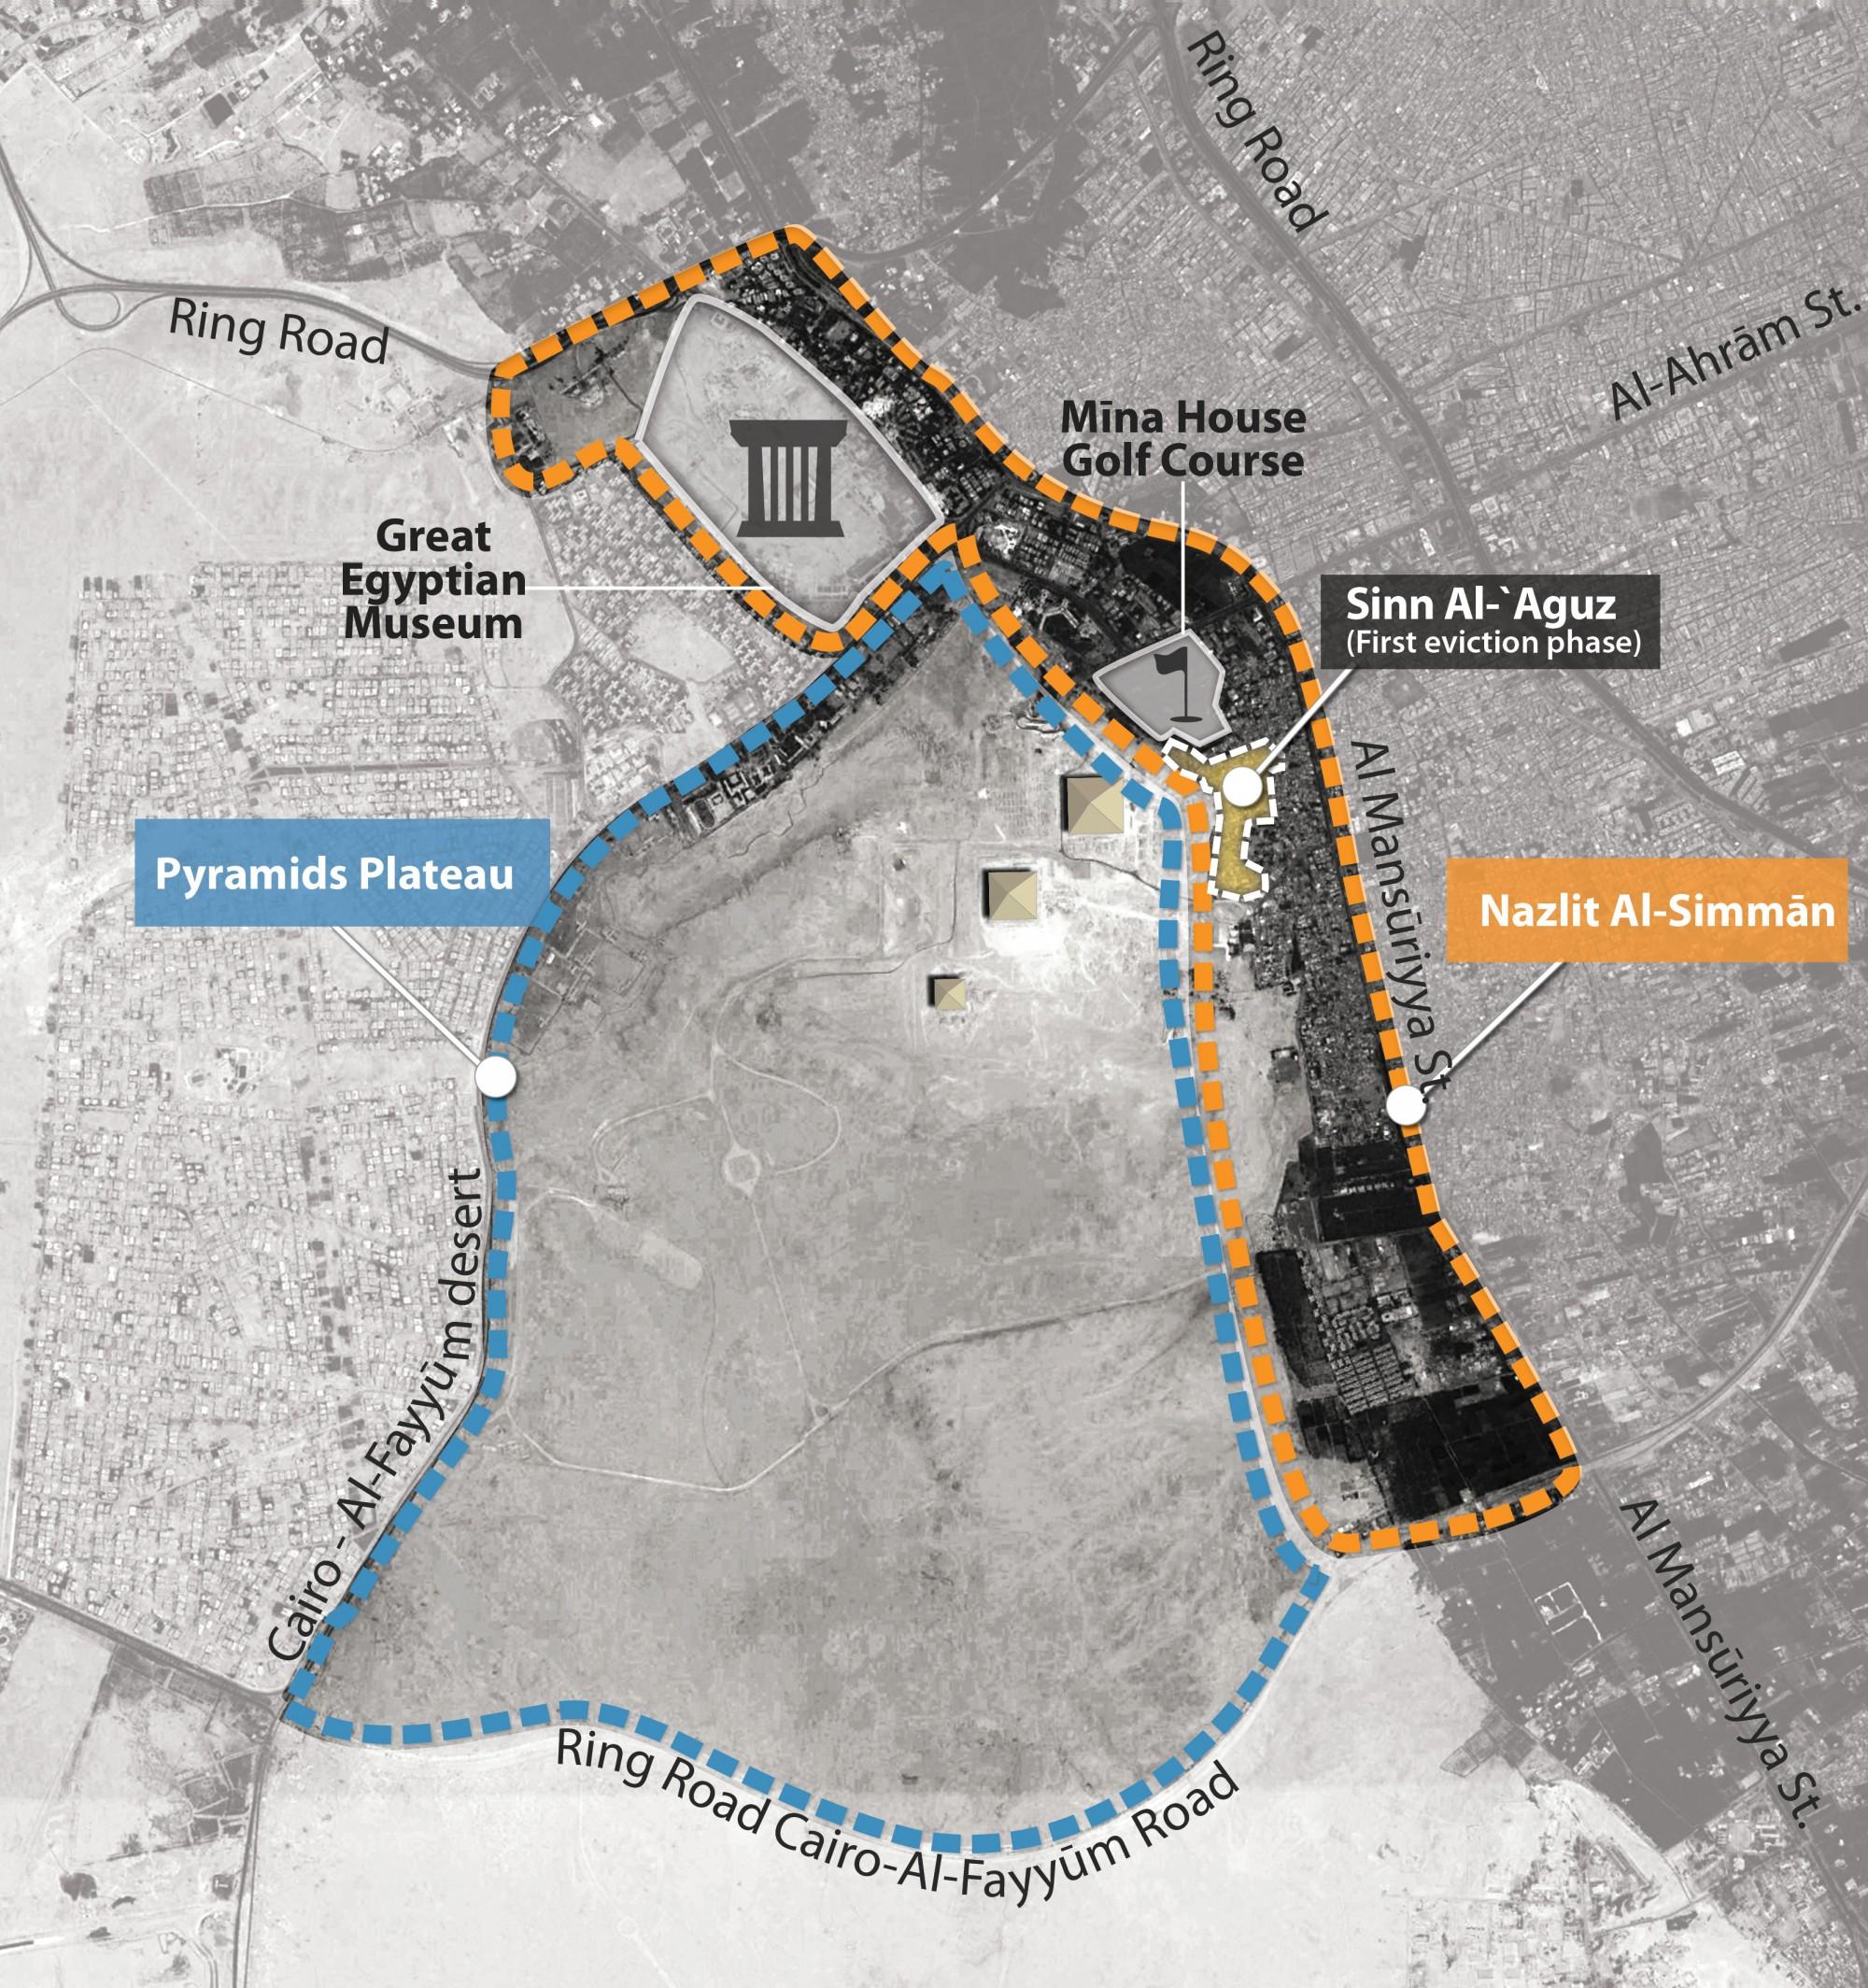 Nazlit al-Simman map